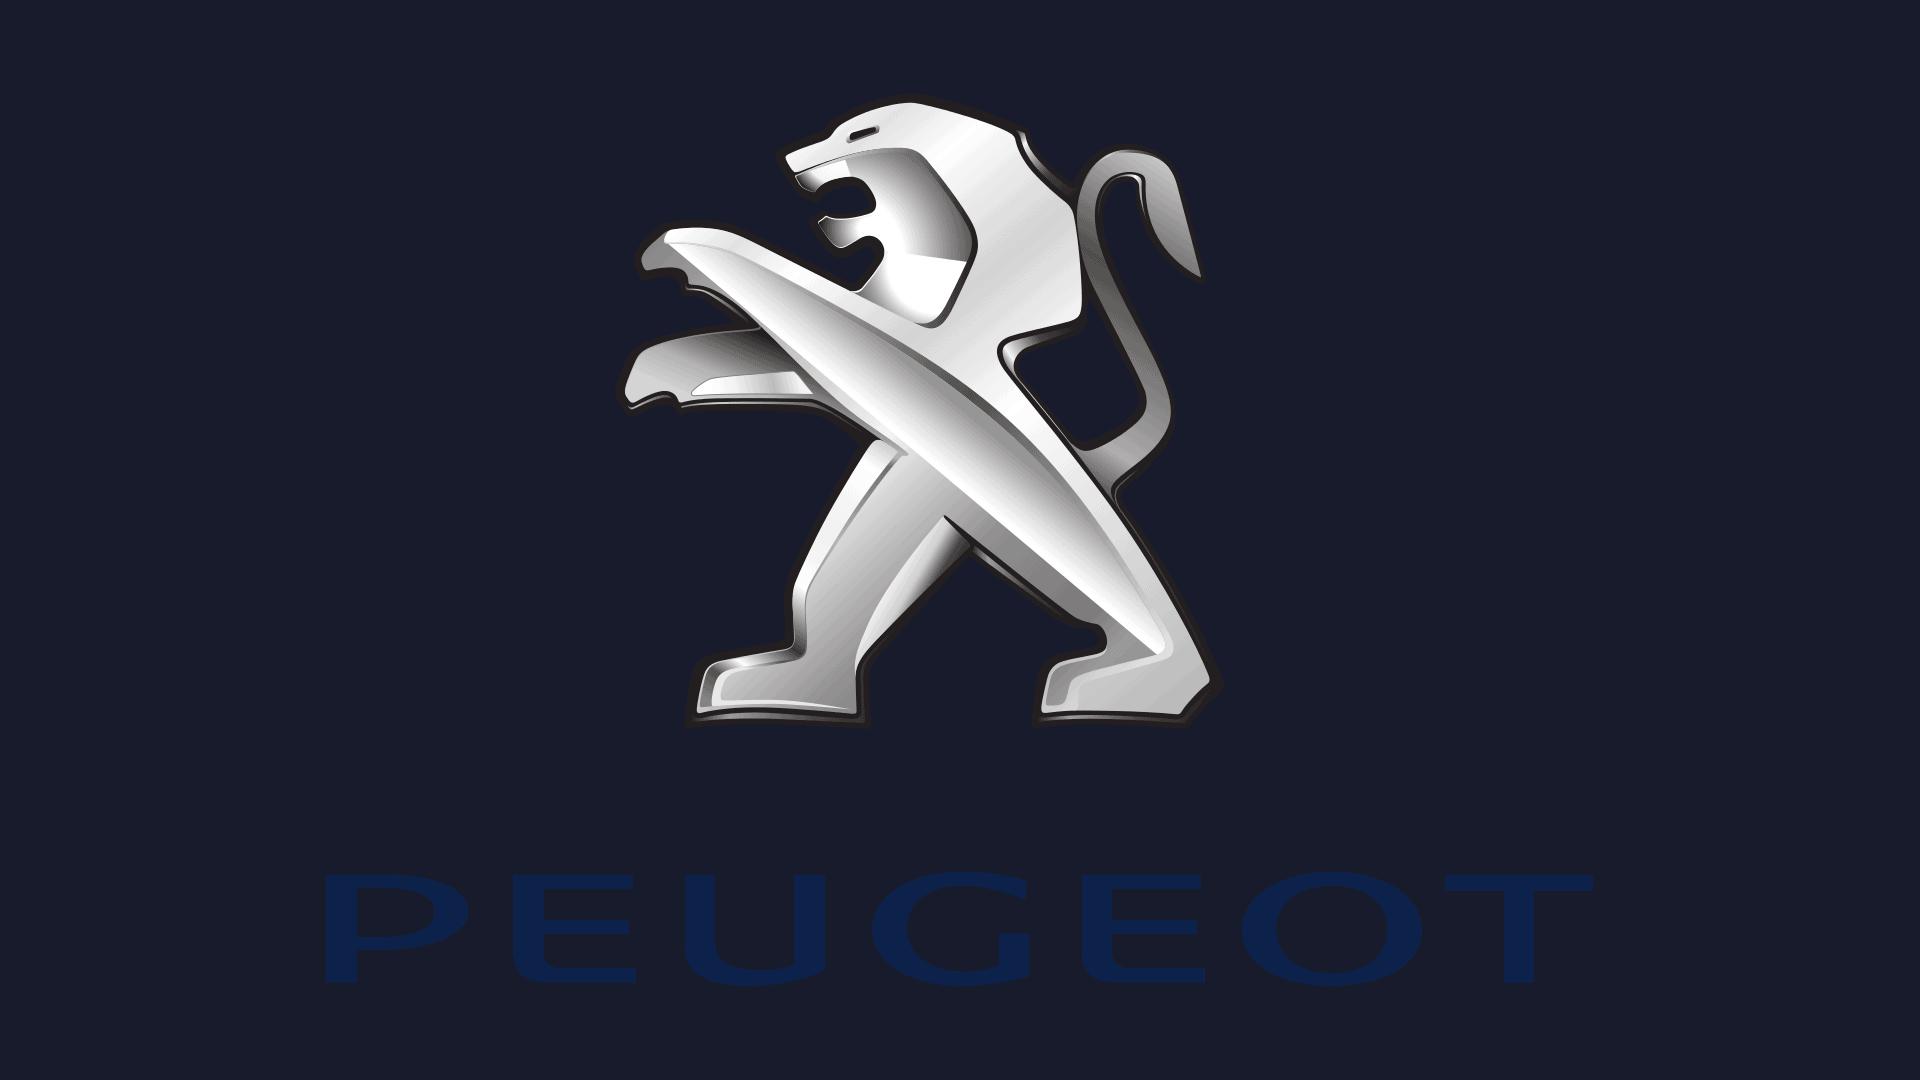 Peugeot-logo-1